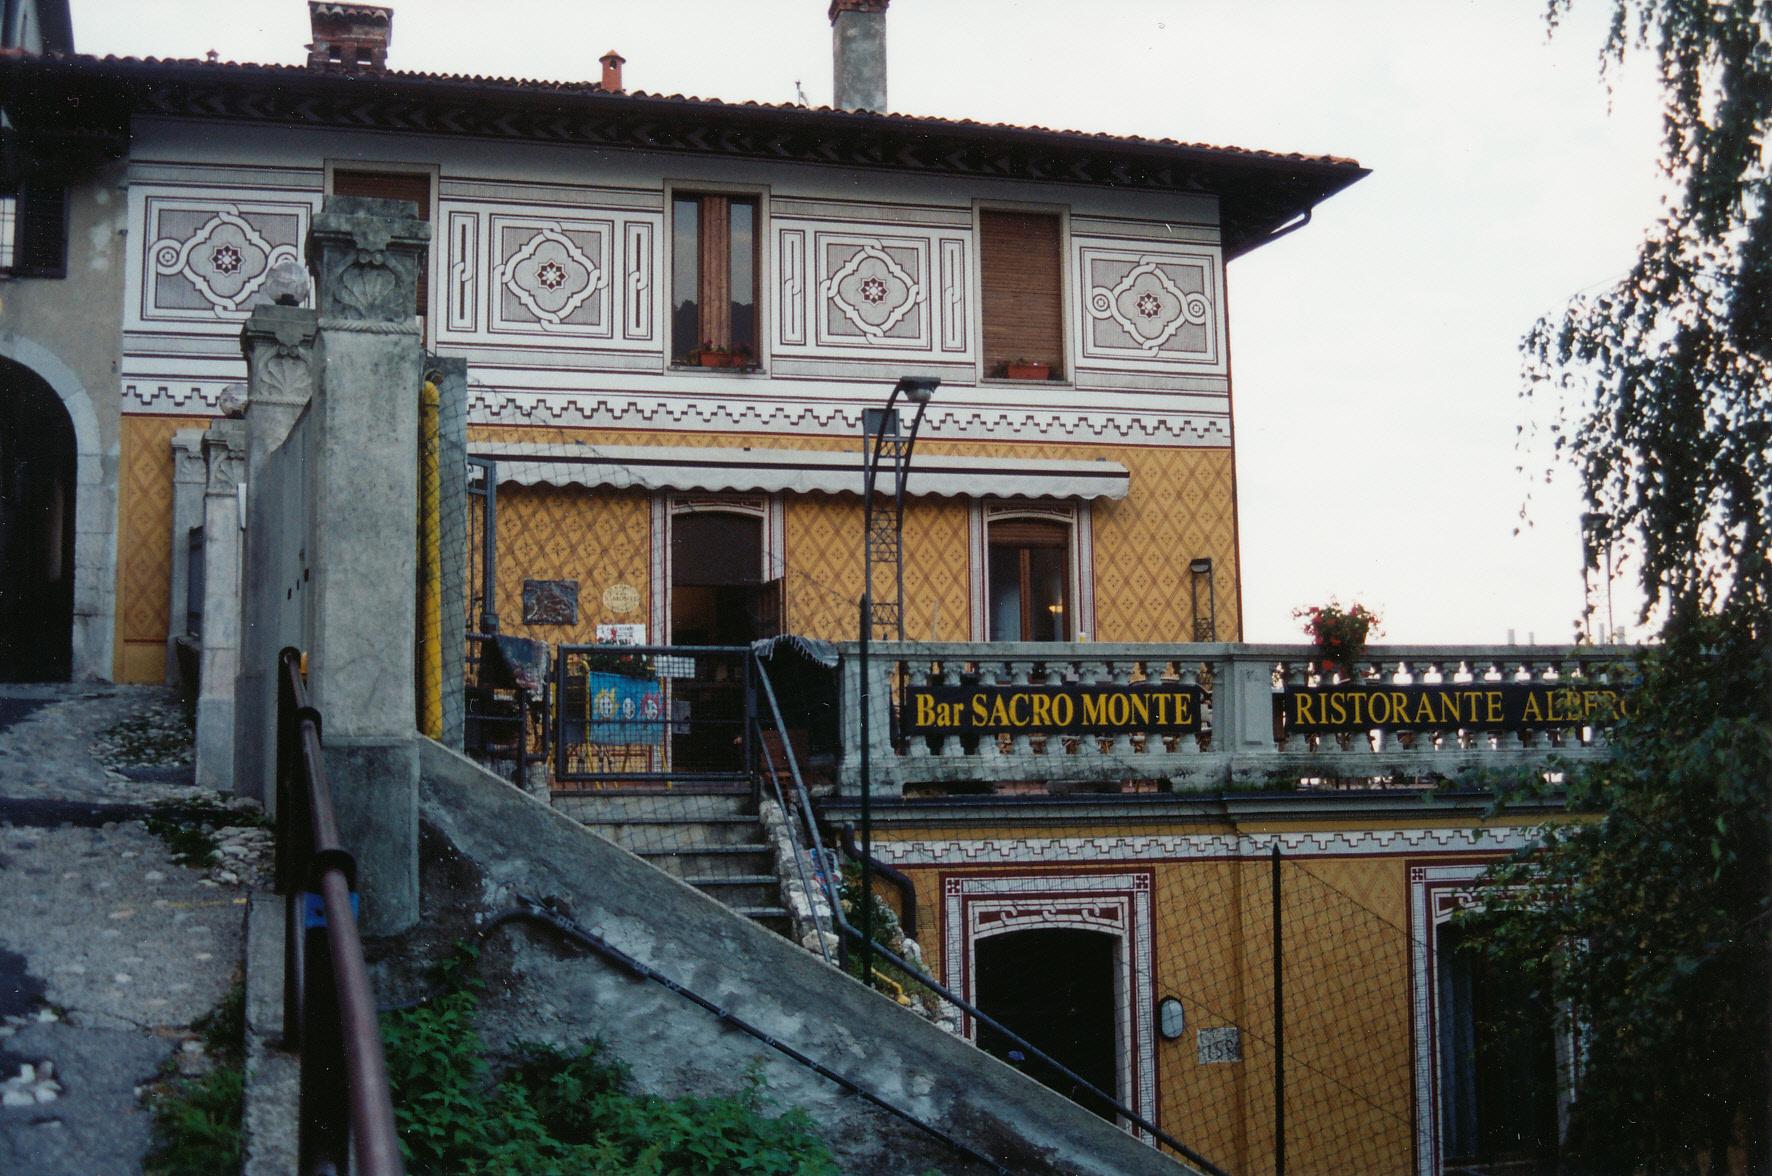 Albergo Ristorante Sacro Monte